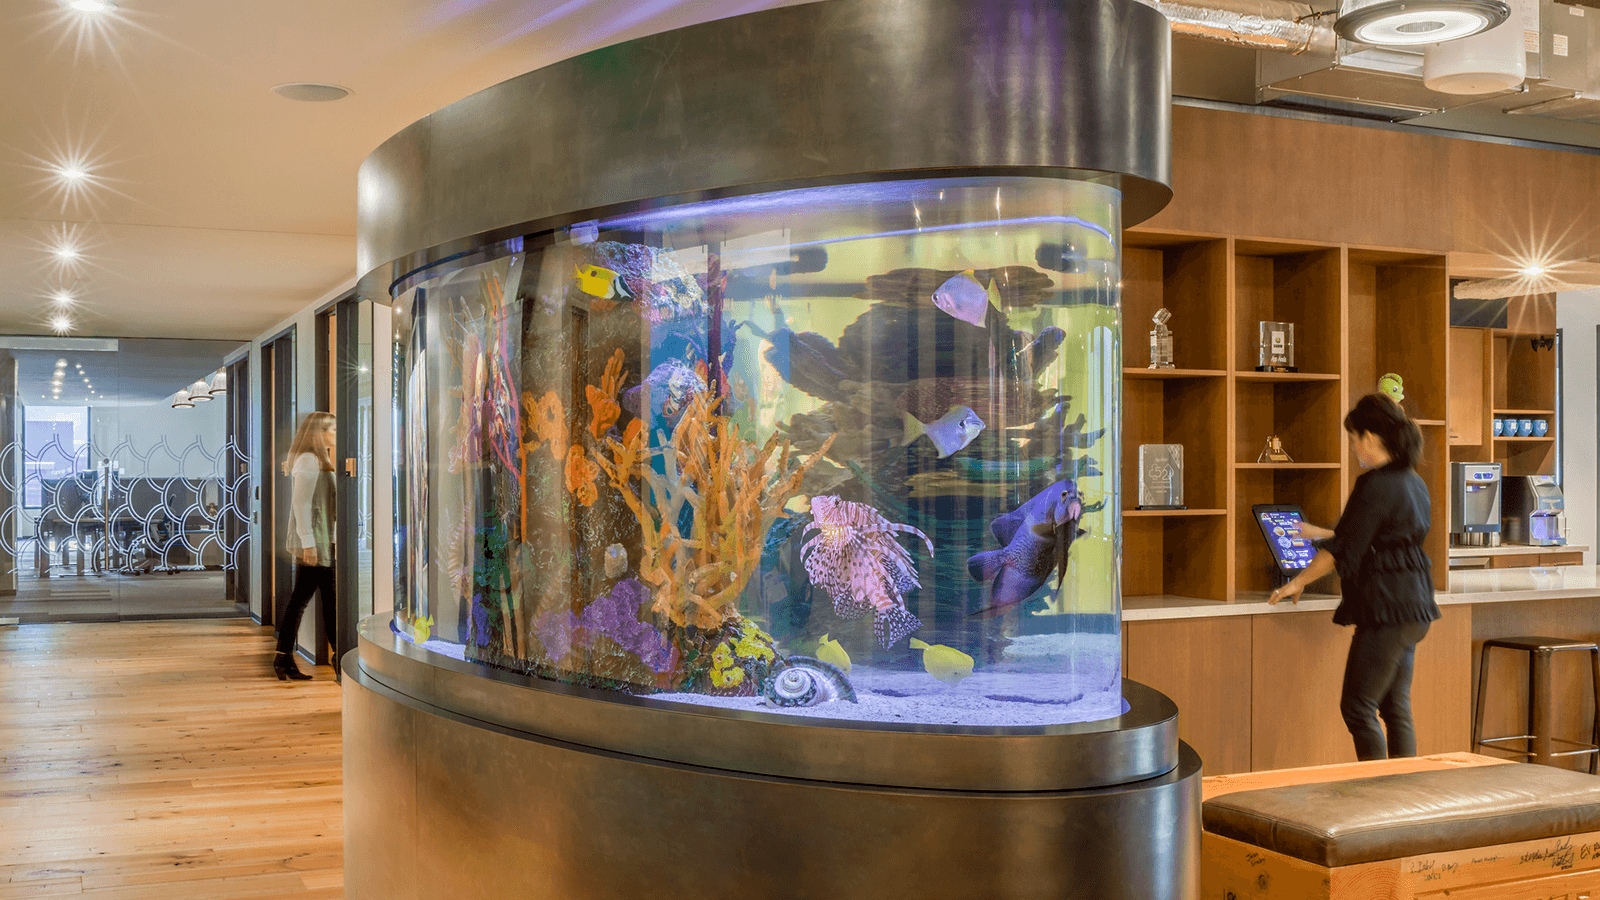 big-fish-games-fish-tank.png